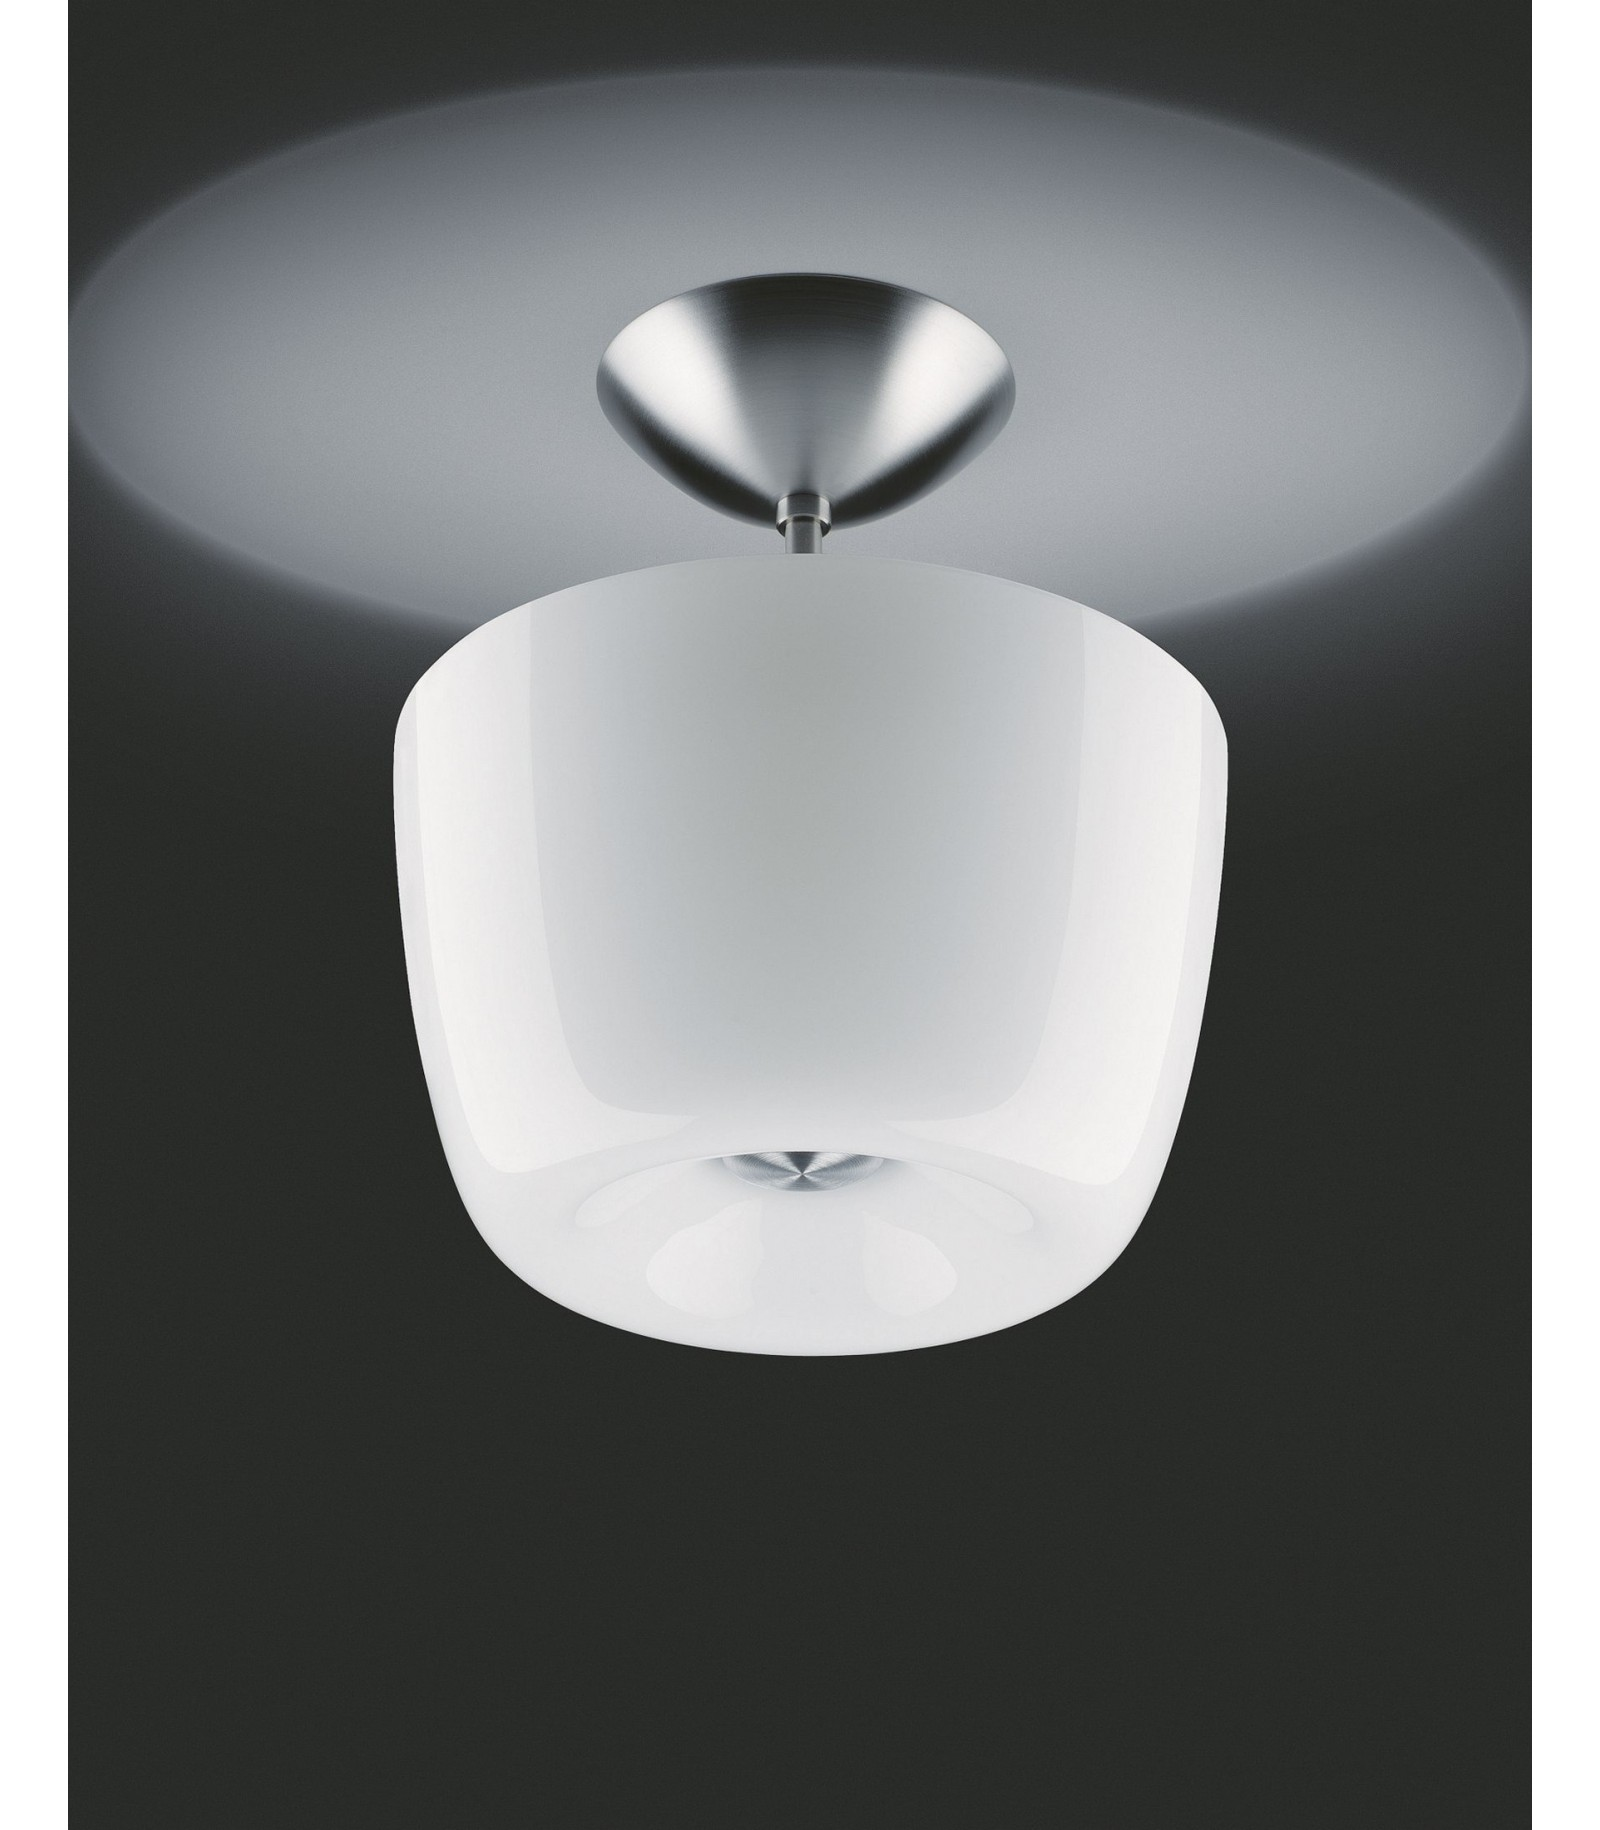 lampada a soffitto lumiere 05 foscarini